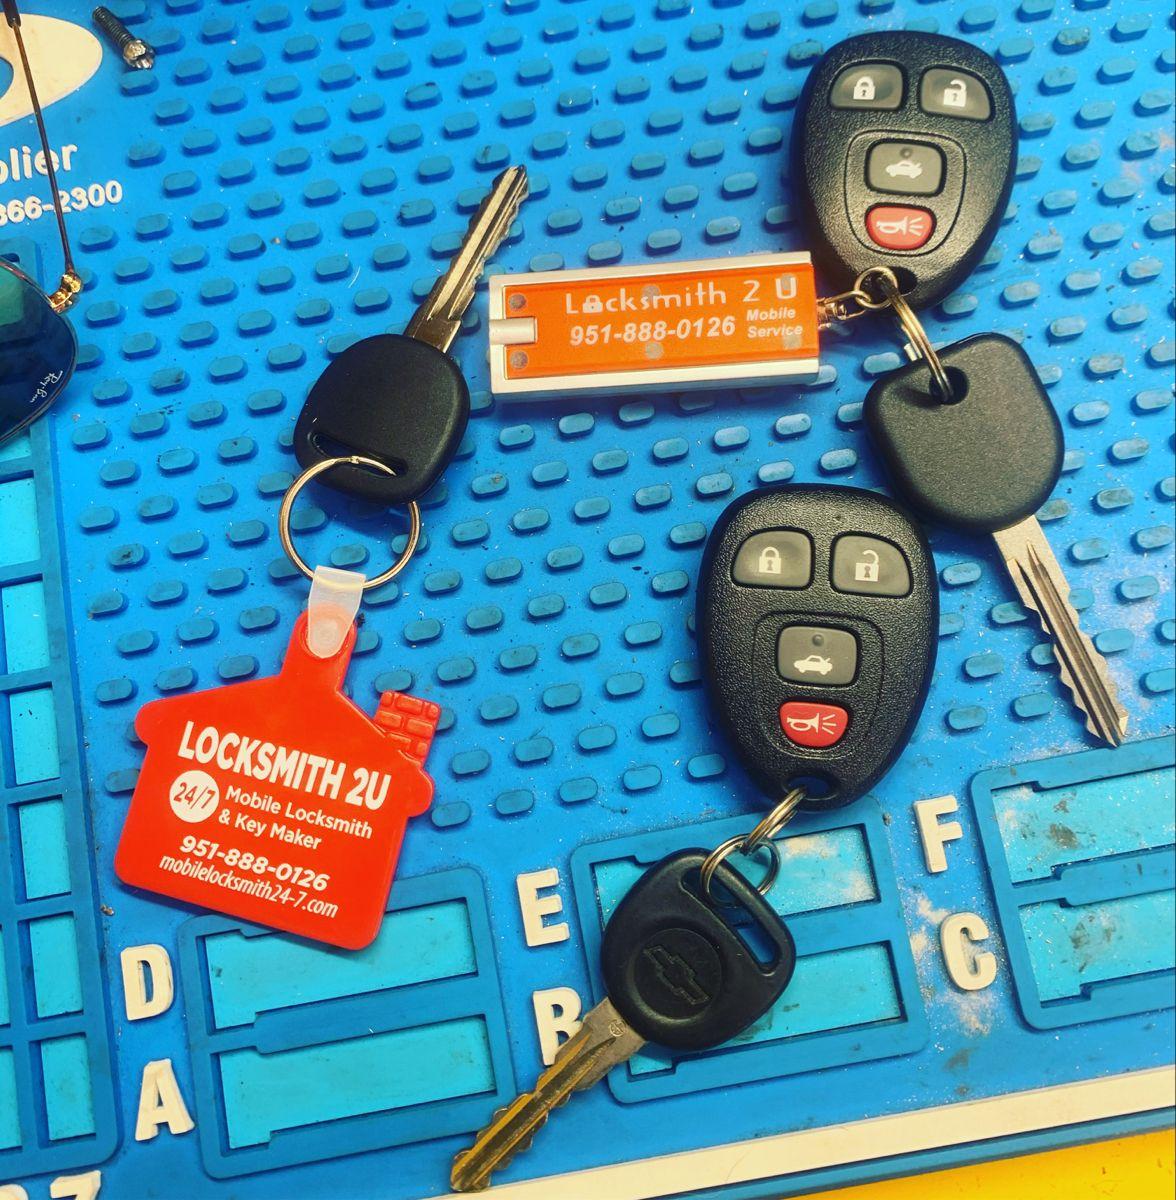 Auto Locksmith Riverside California Locksmith Mobile Locksmith Auto Locksmith